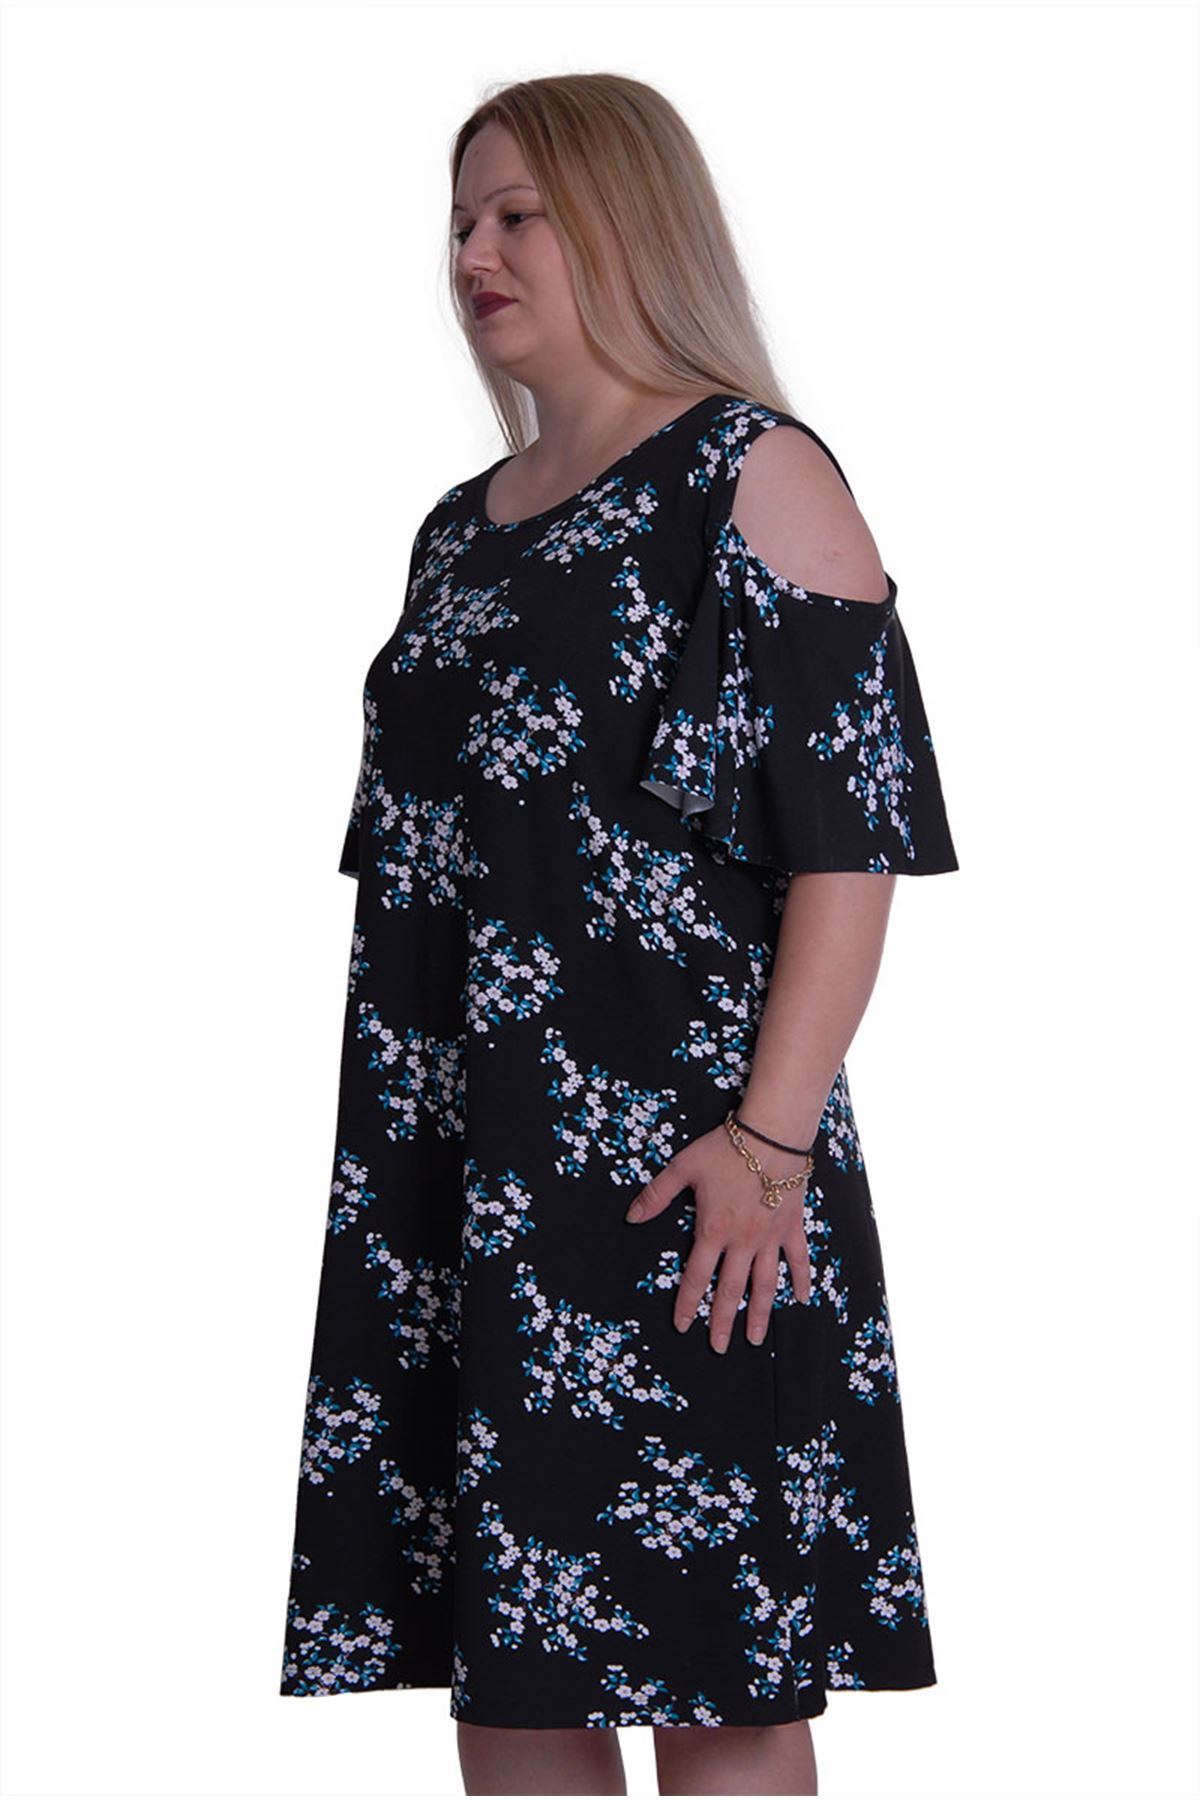 Çiçekli İspanyol Kol Elbise 2D-0163